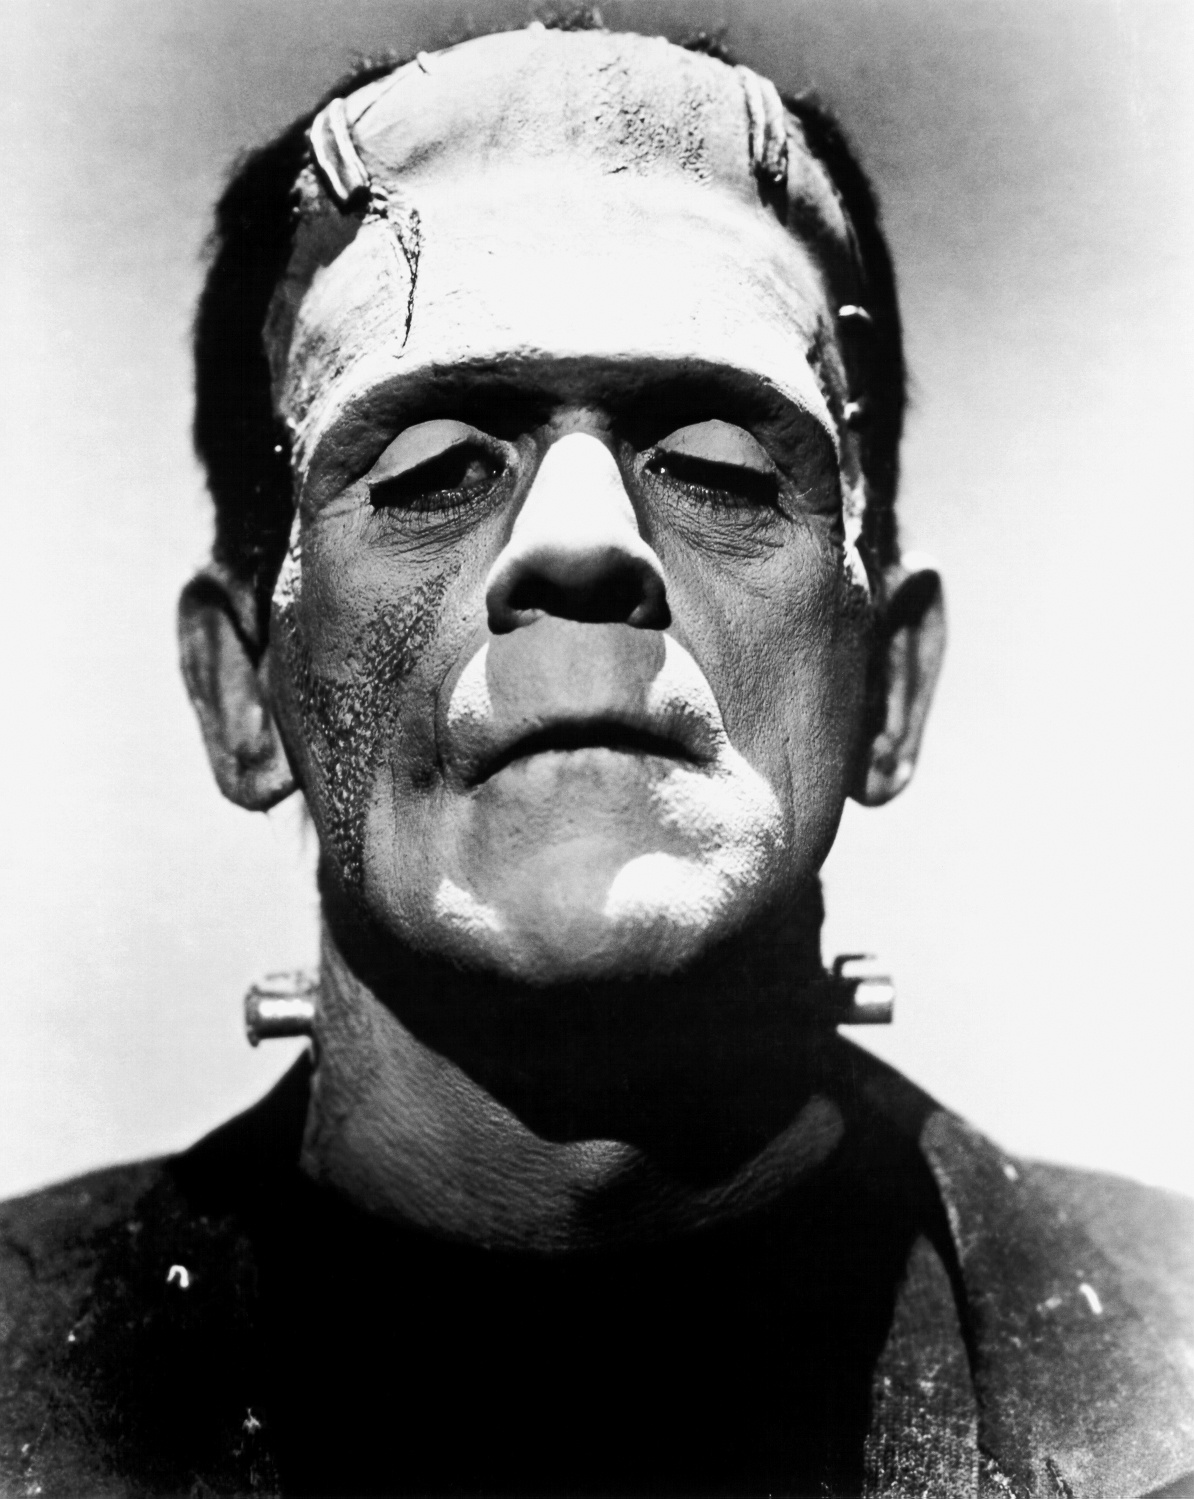 Frankenstein from the 1931.